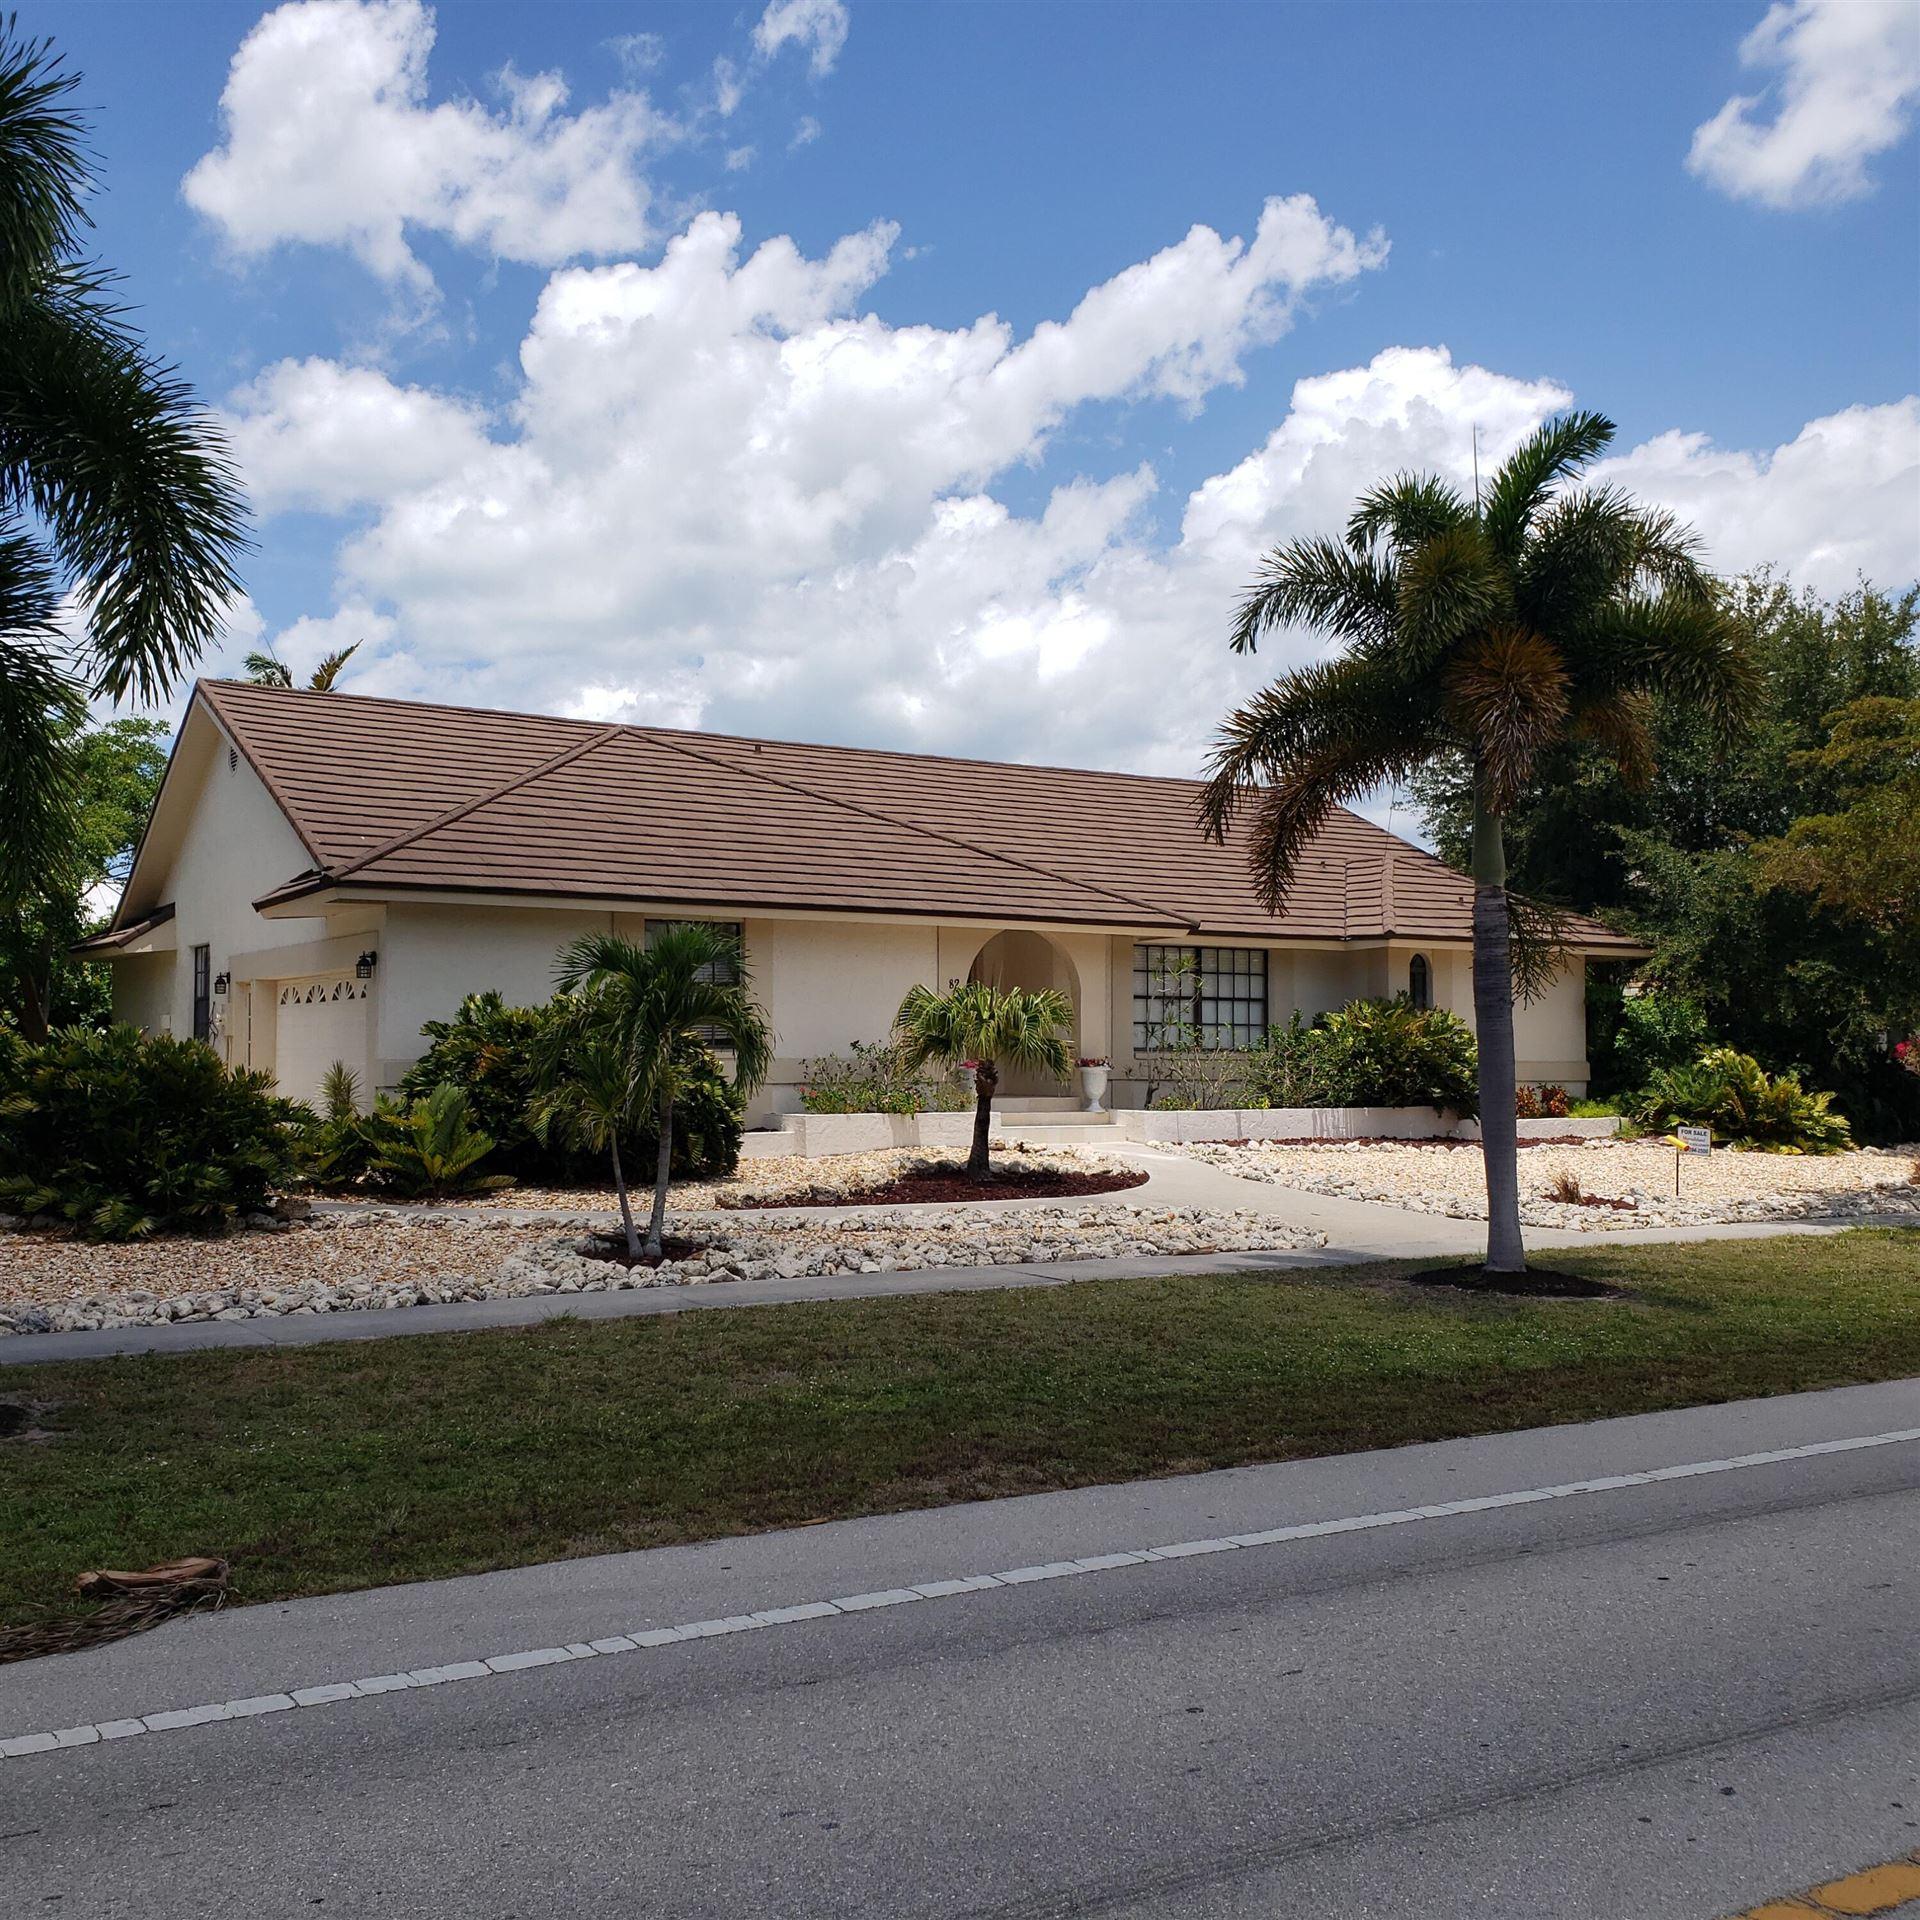 82 N BARFIELD Drive, Marco Island, FL 34145 - MLS#: 2202357